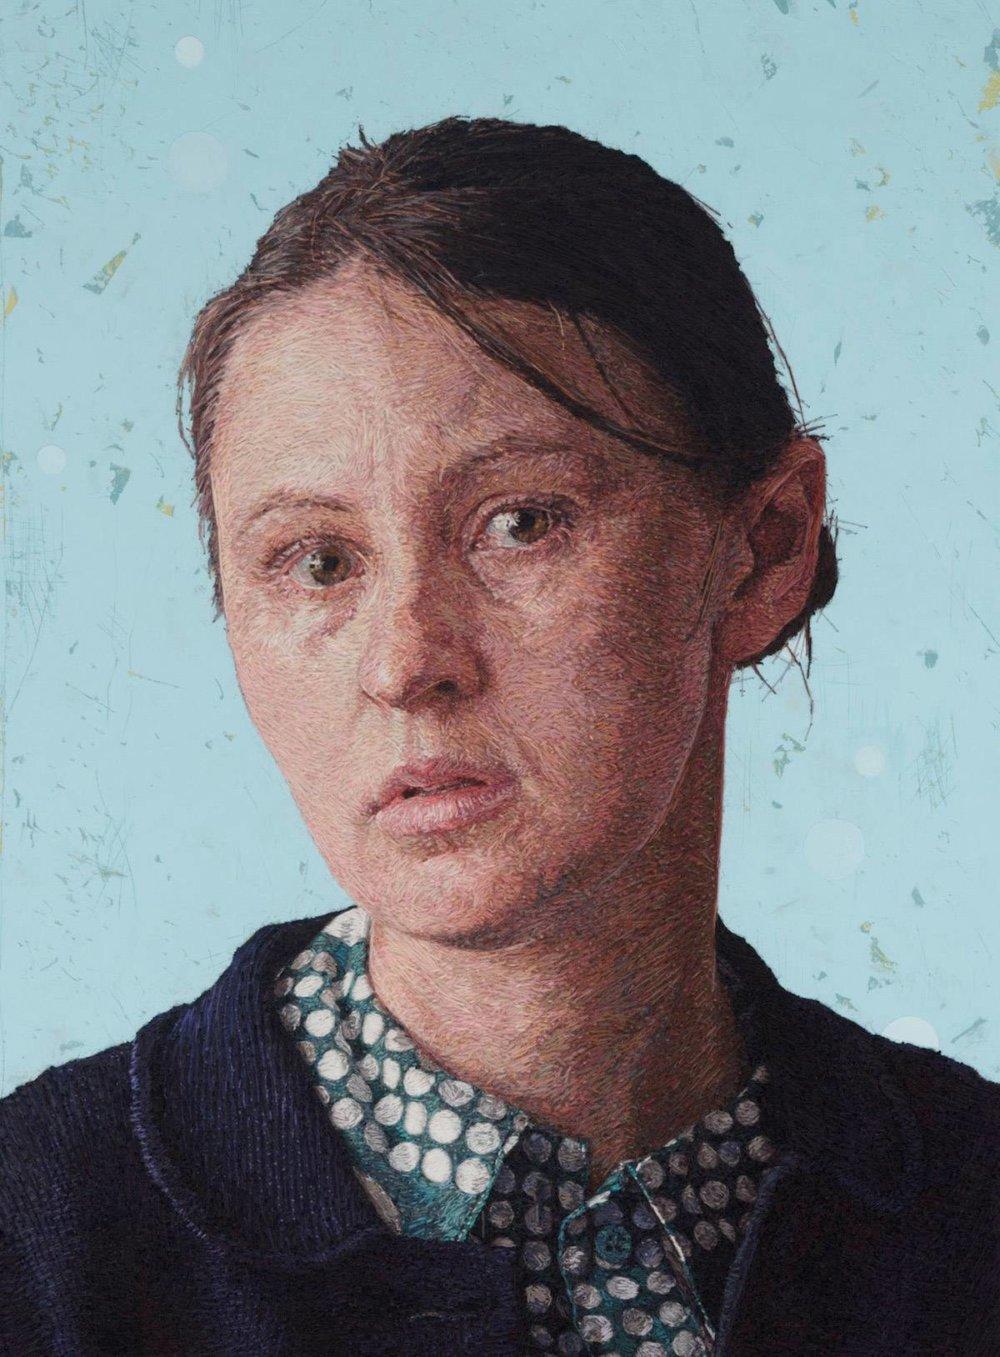 Realistic Embroidered Portraits By American Artist Cayce Zavaglia 1